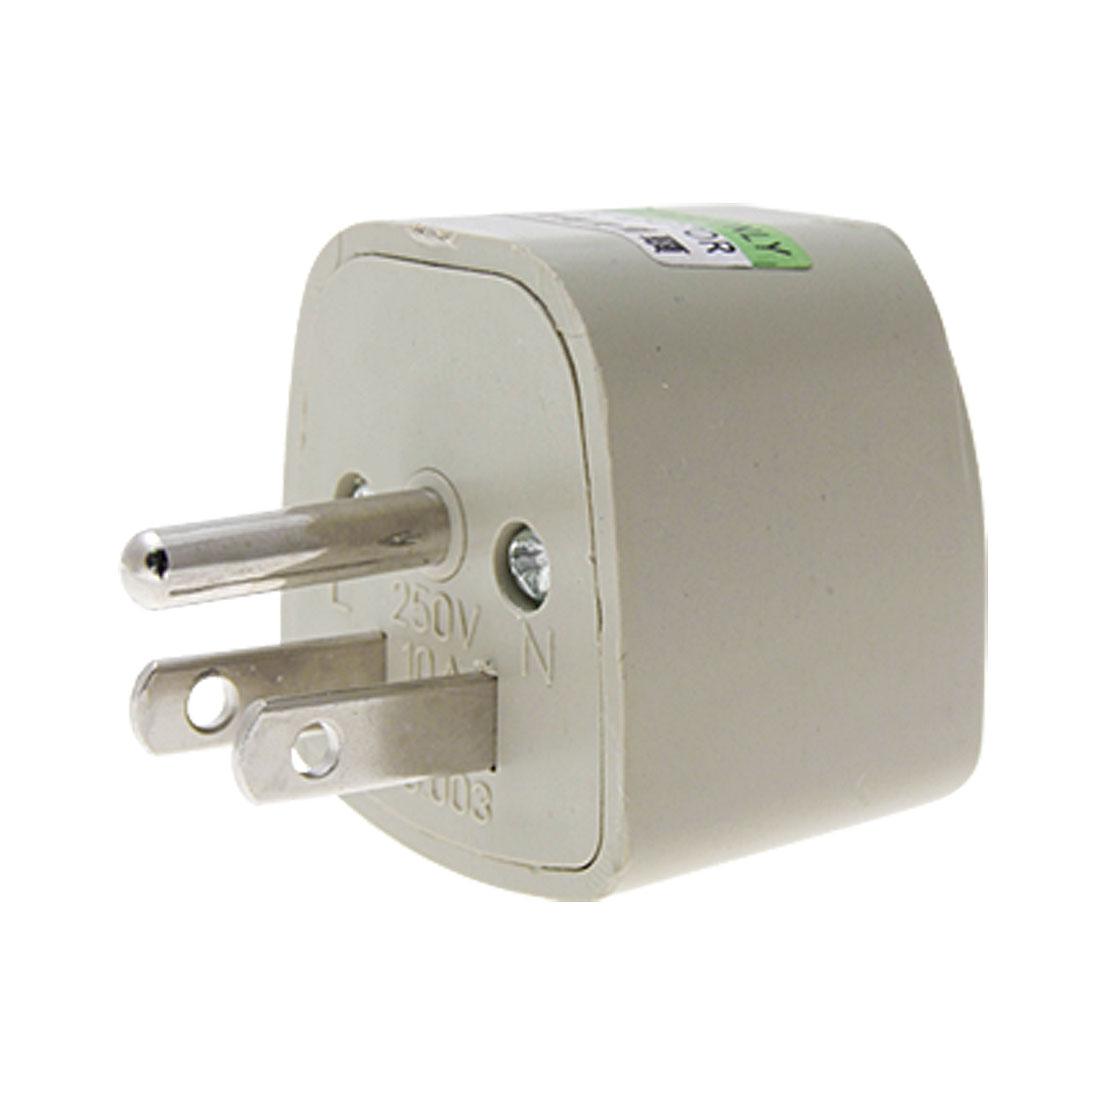 AU US UK Socekt to US AC 250V Power Plug Adapter Converter Gray